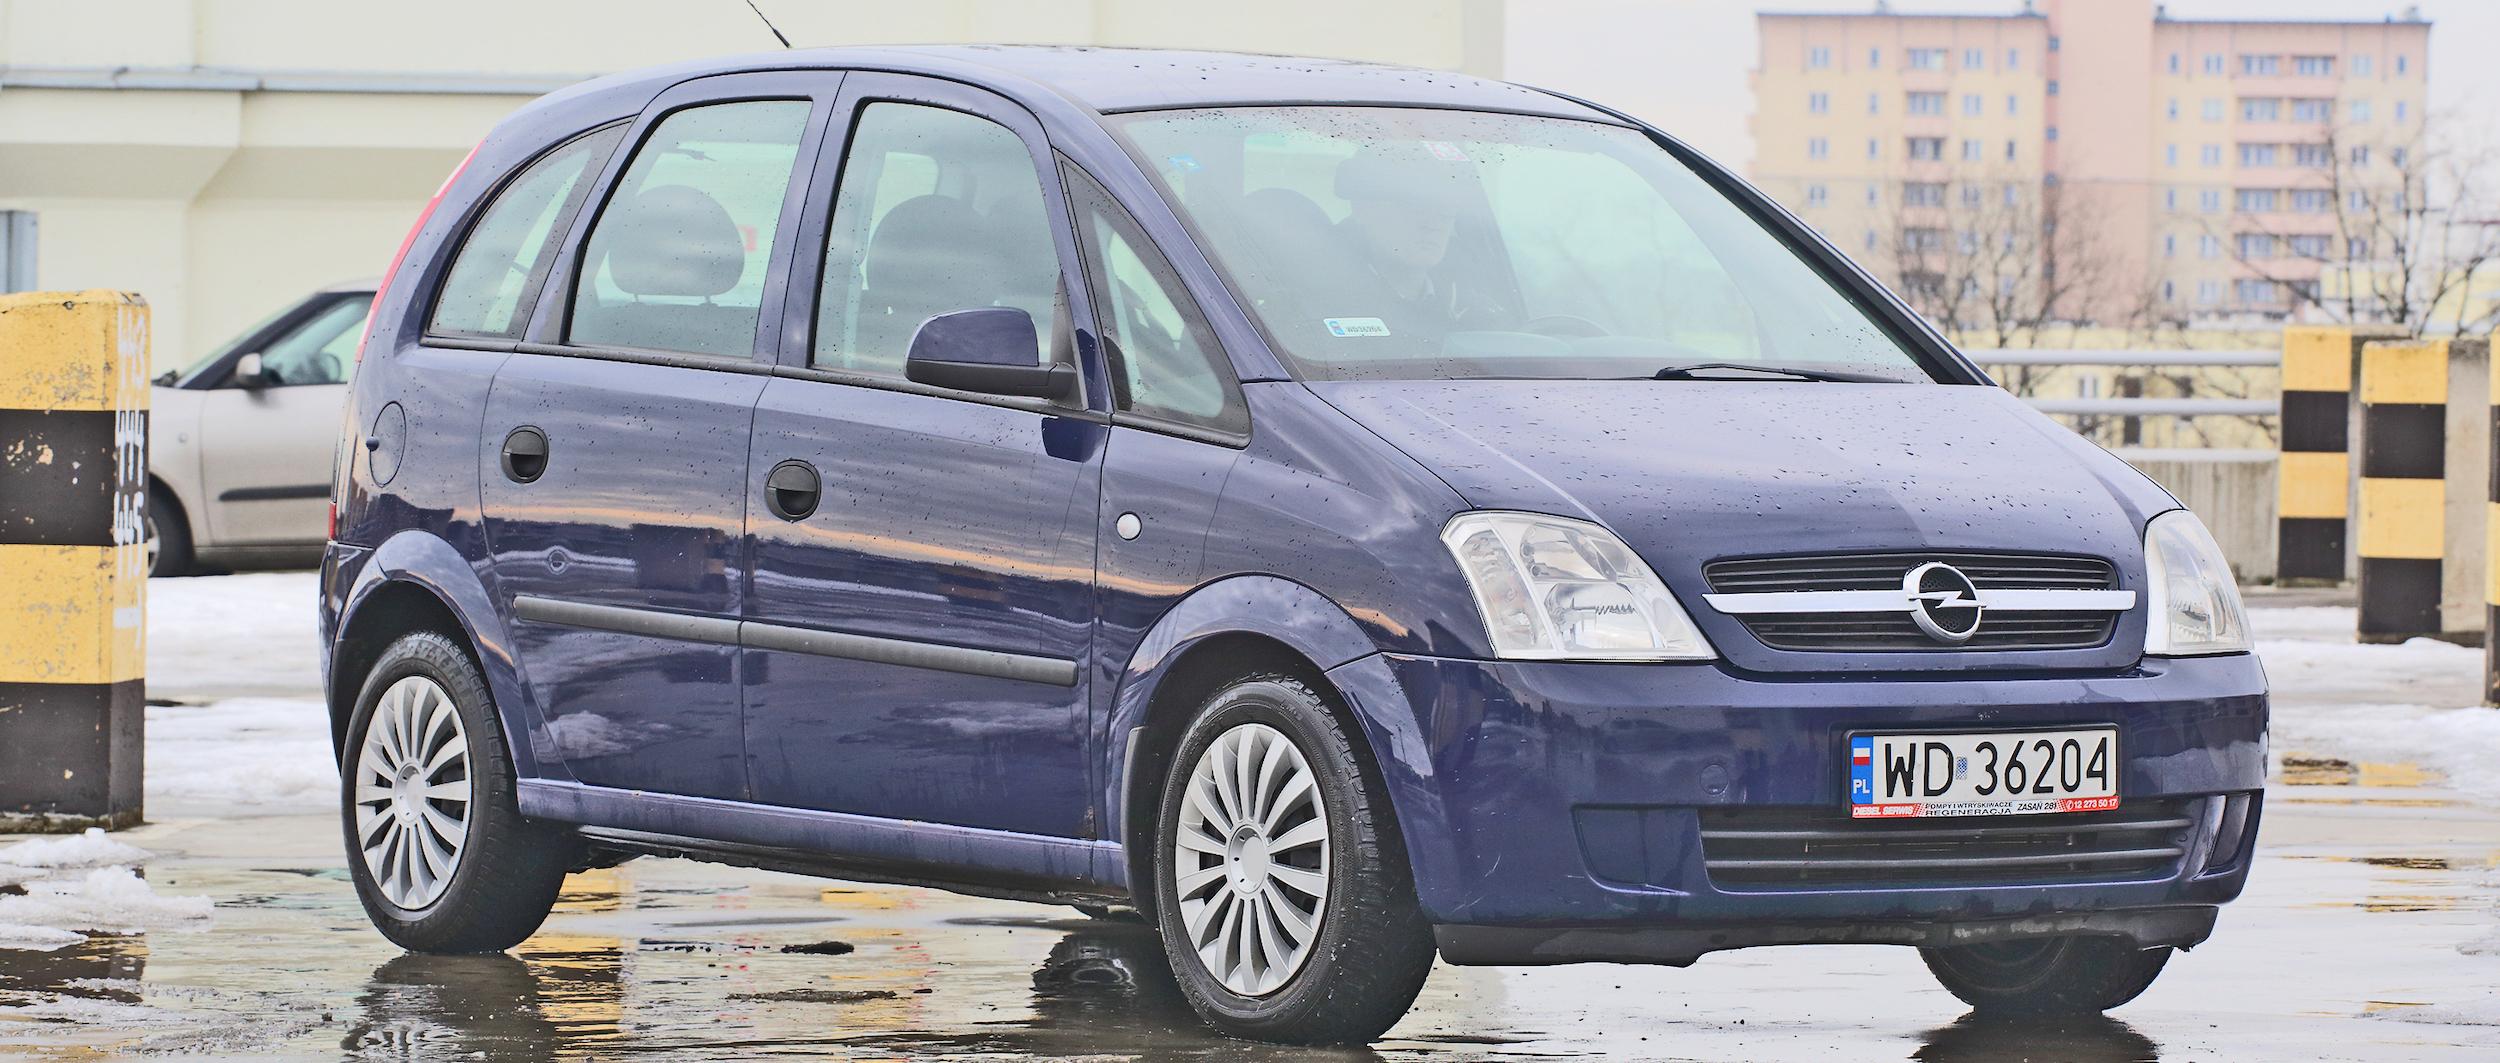 Opel Meriva A(2003-2010)